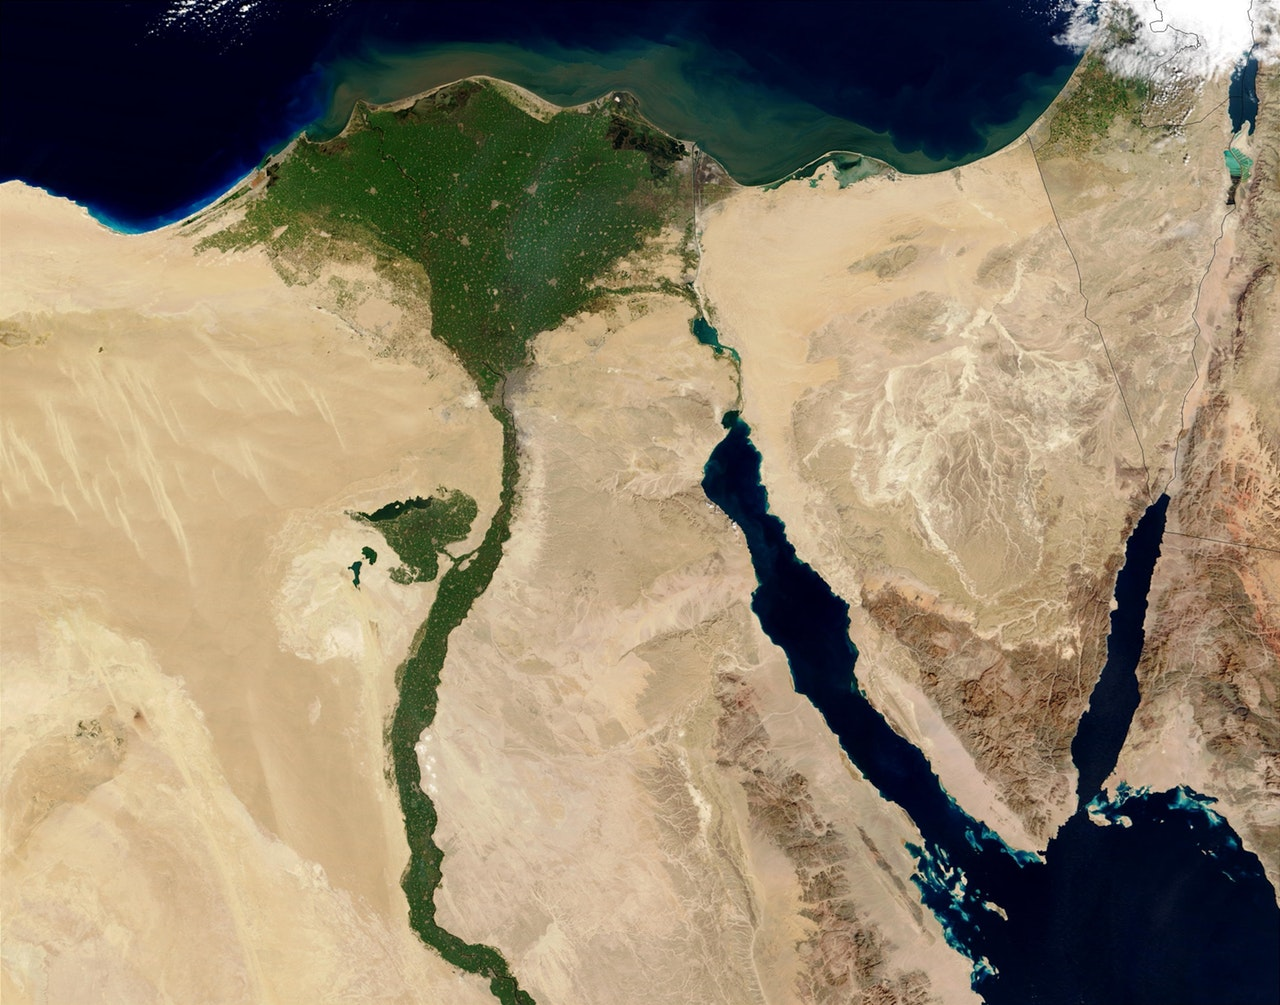 aerial-view-egypt-land-87075.jpg